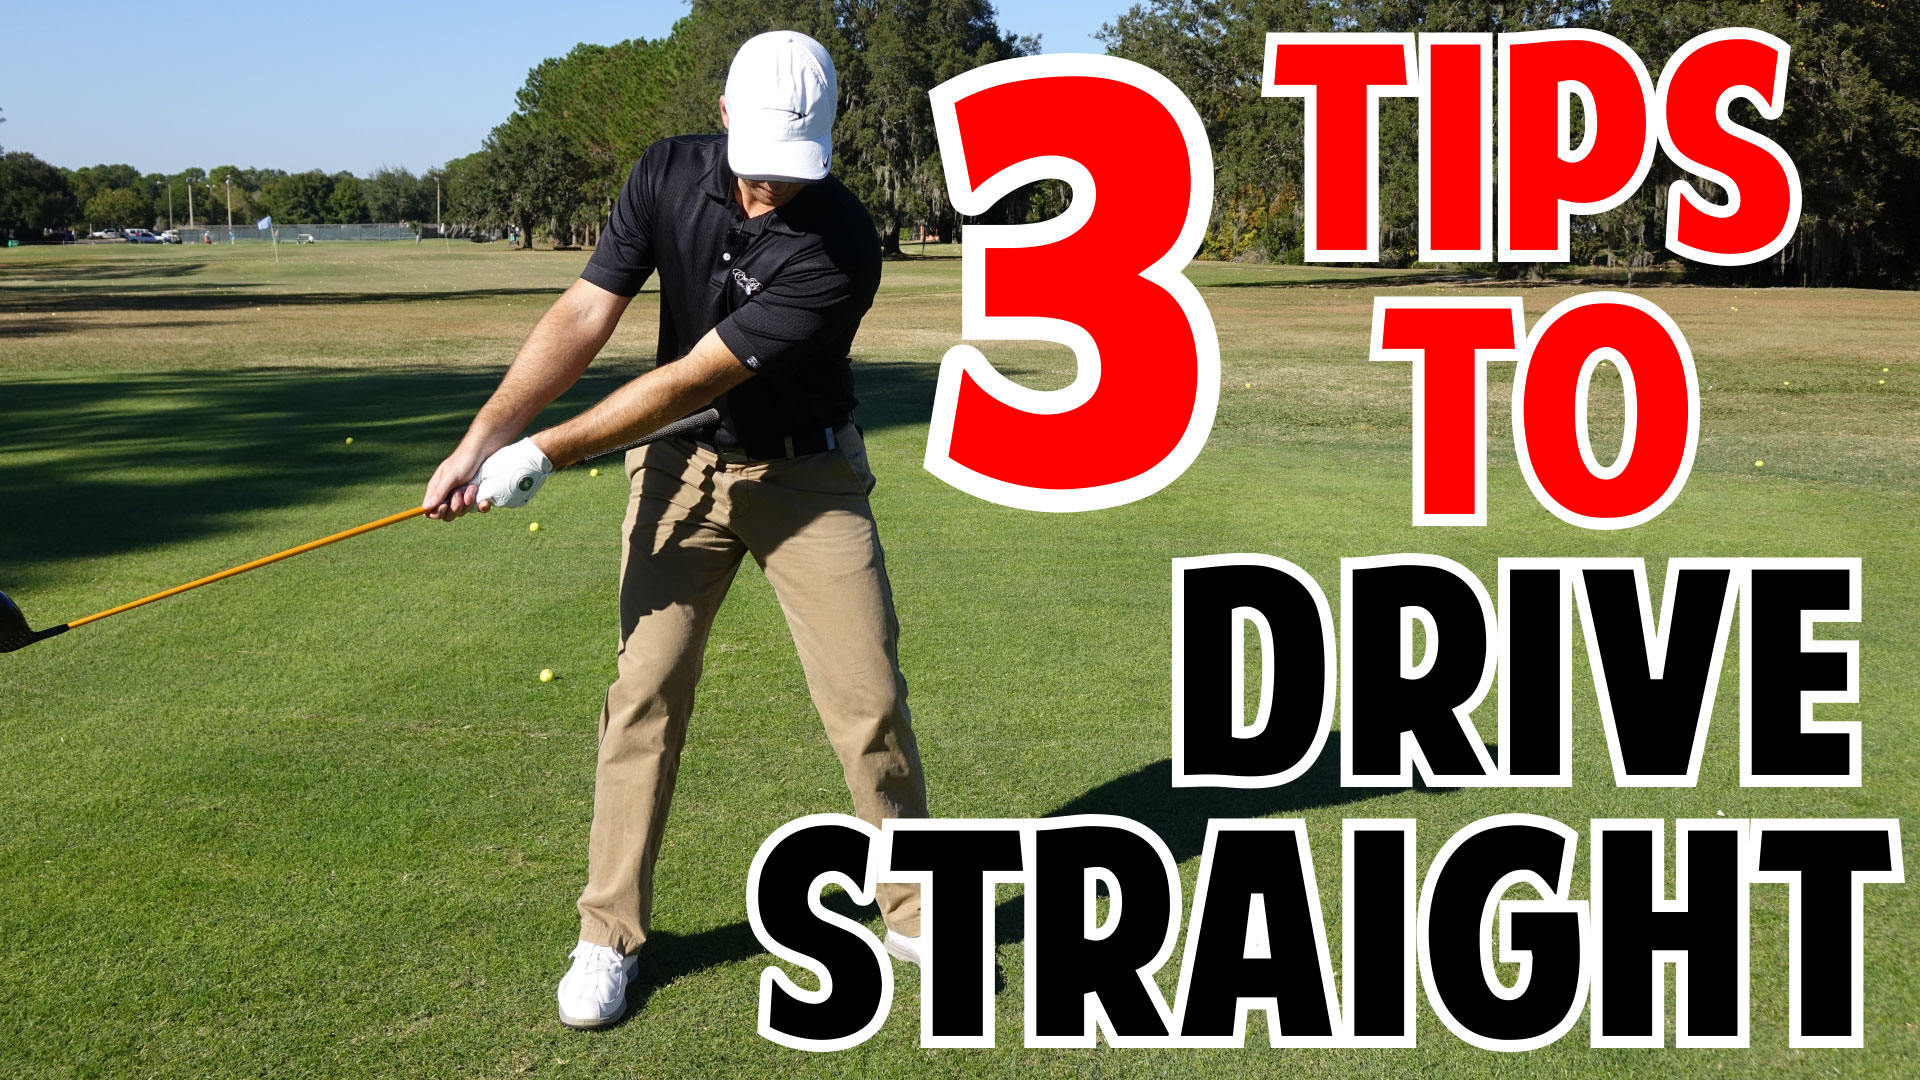 how to hit straighter shots at billard